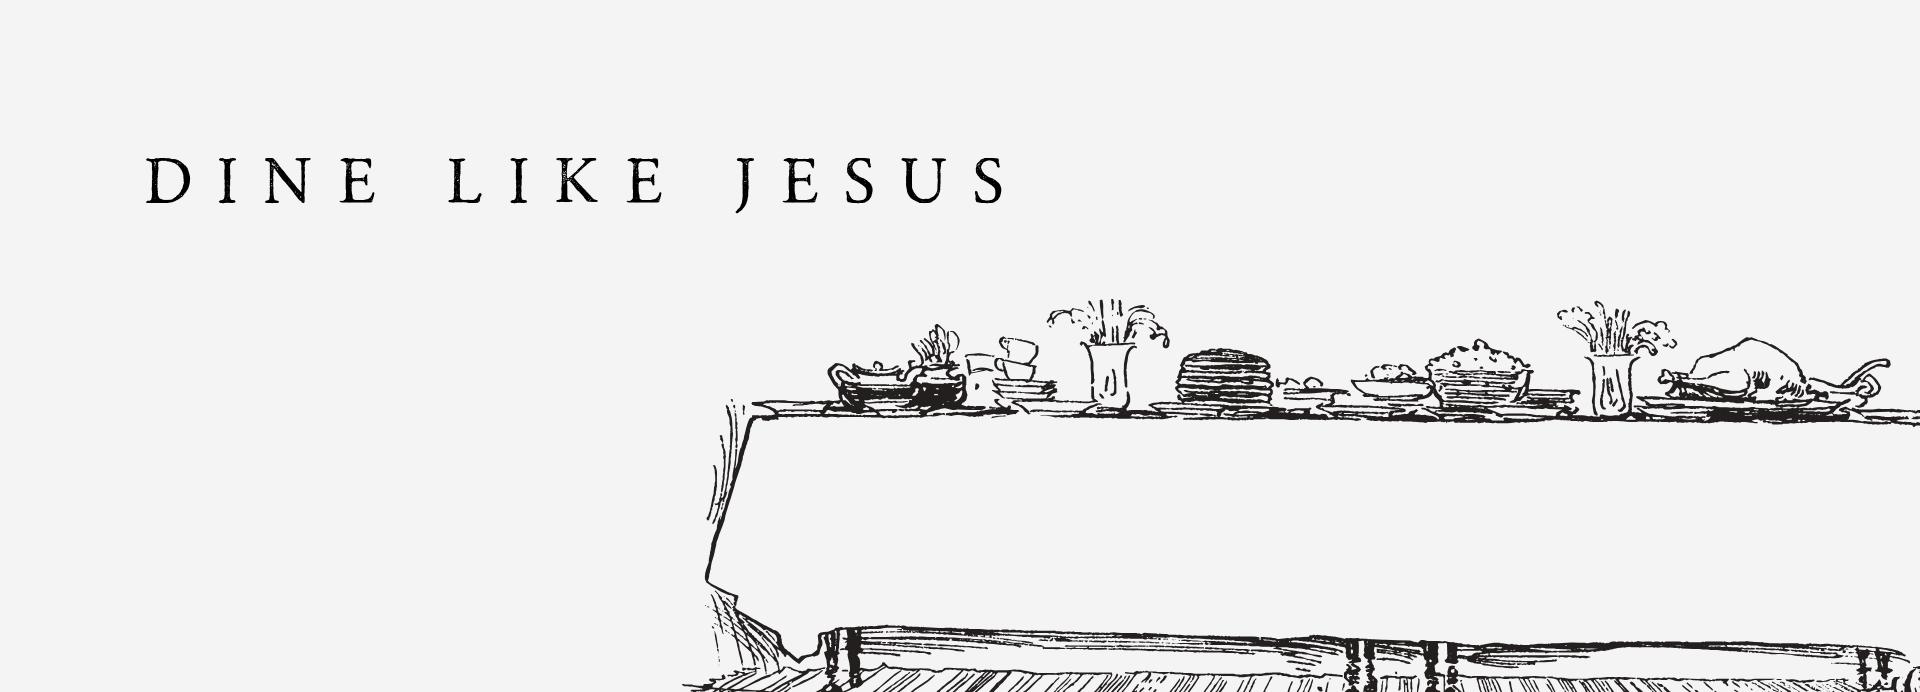 1920x692px_ Dine Like Jesus.png